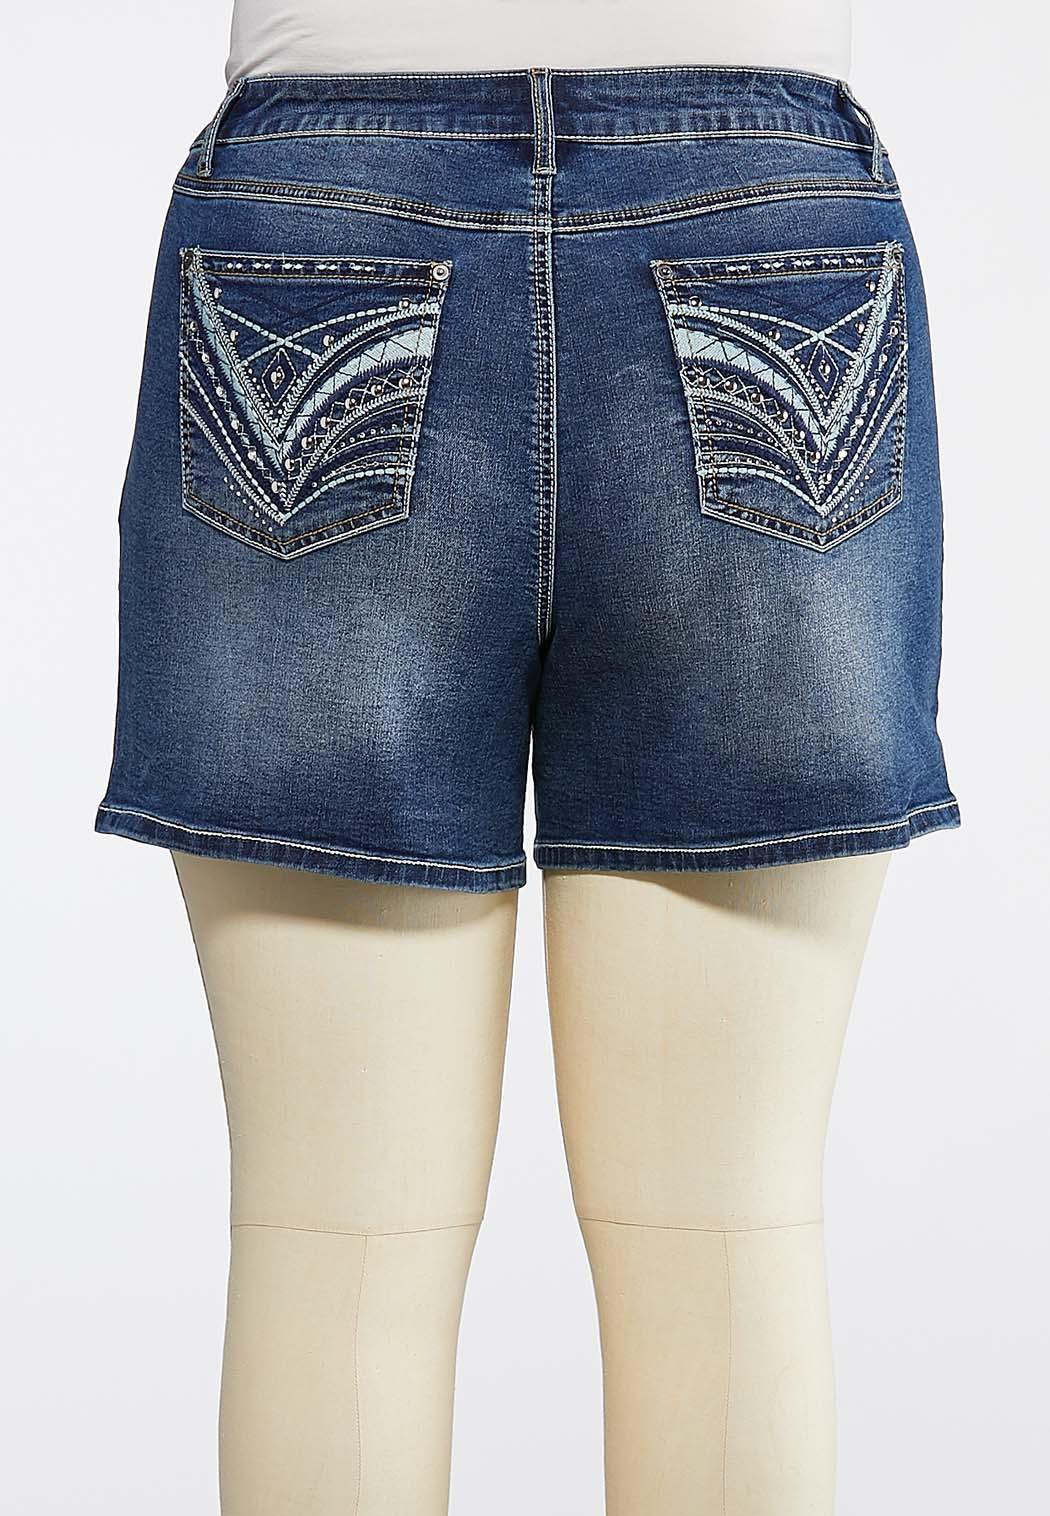 Plus Size Stitch And Stone Denim Shorts